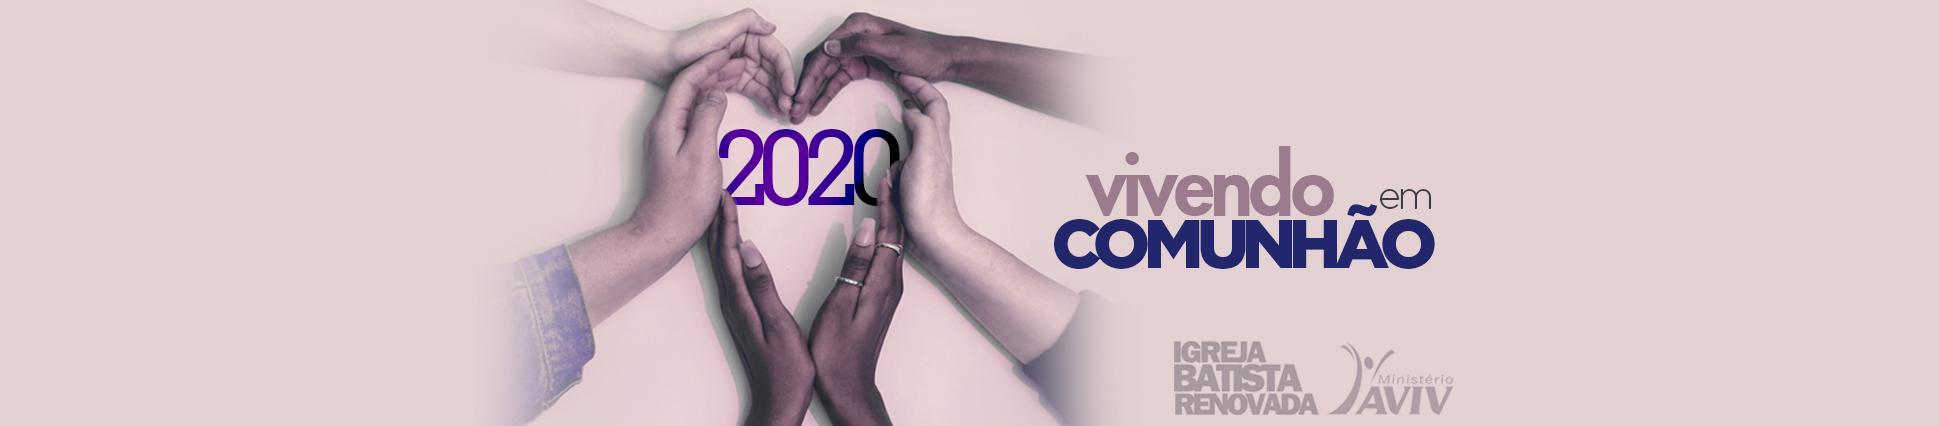 tema 2020